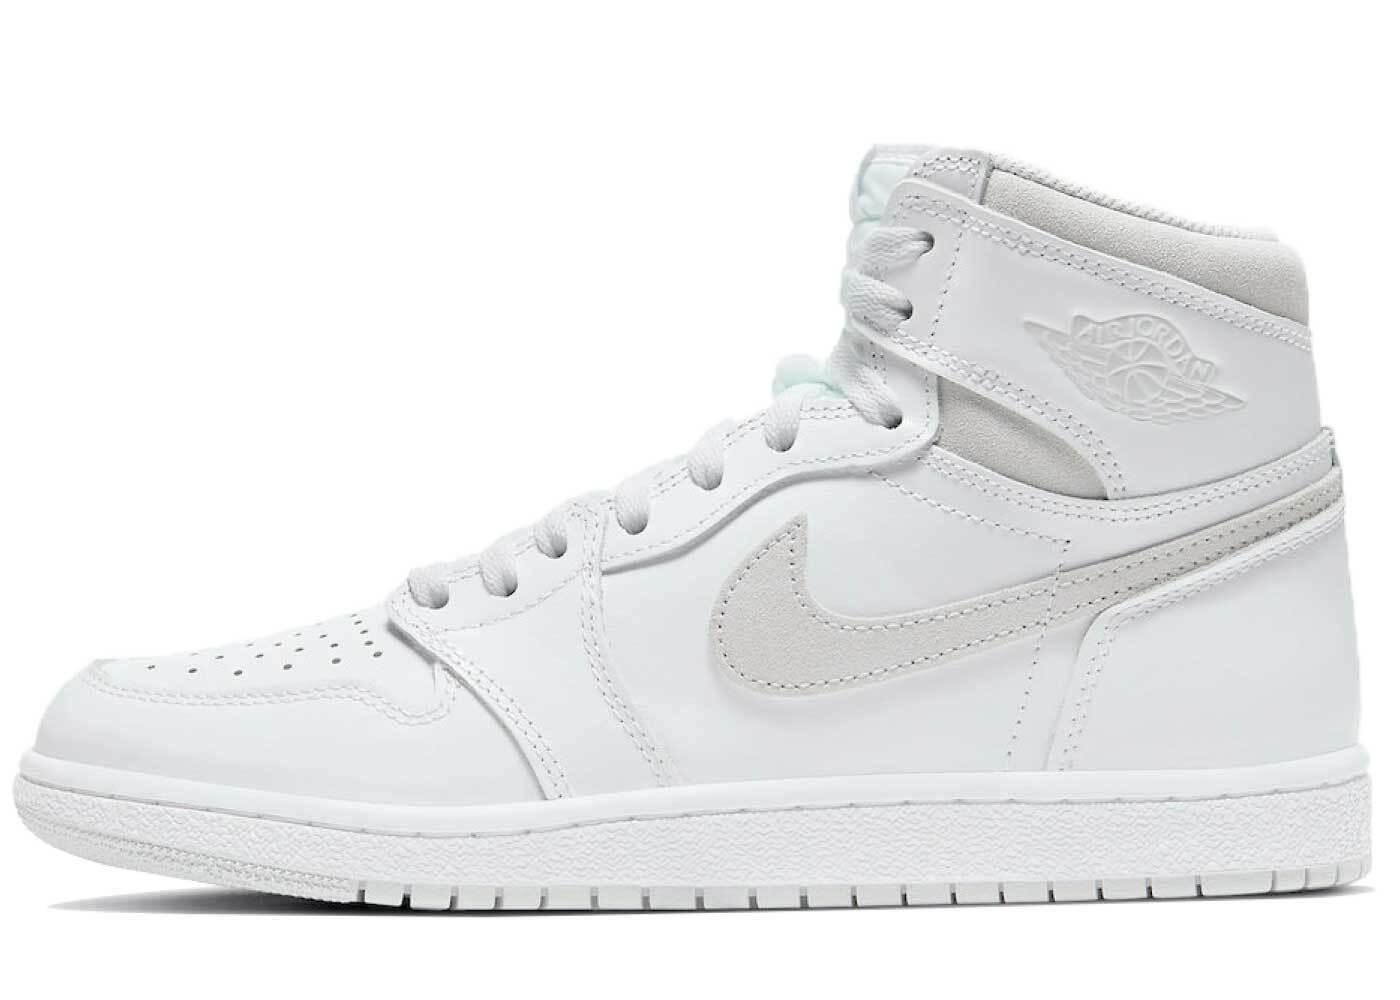 Nike Air Jordan 1 High 85 Neutral Greyの写真